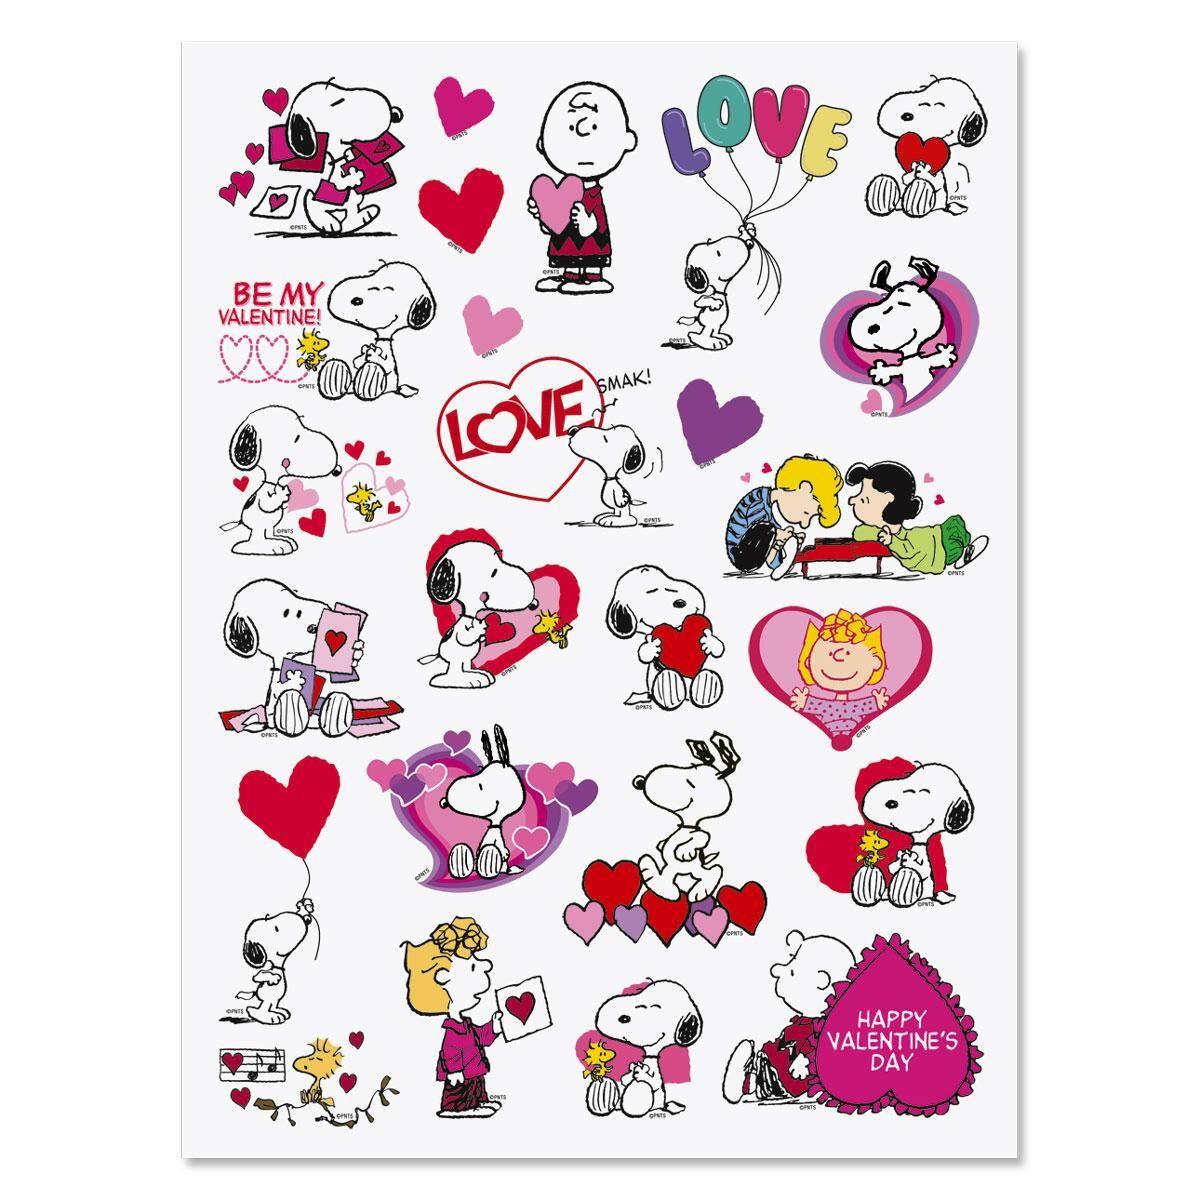 PEANUTS® Valentine Stickers -  Buy 1 Get 1 Free!